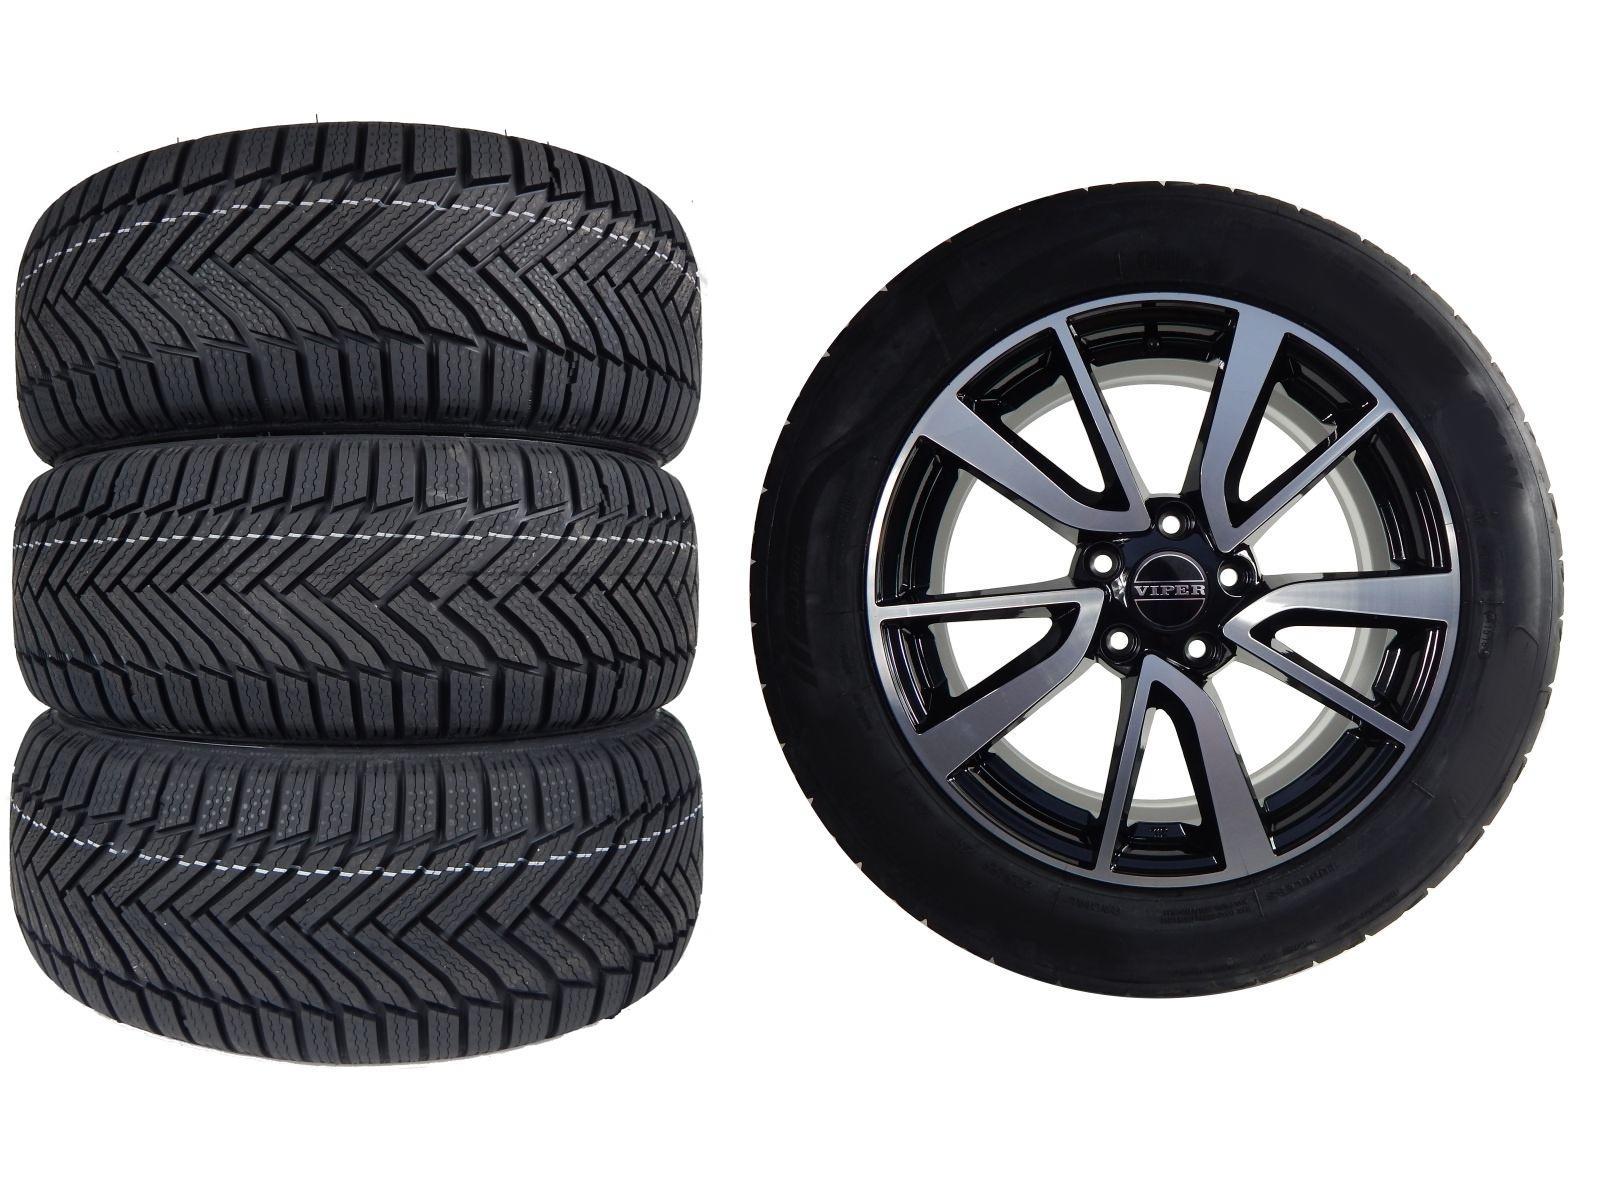 Koła Zimowe Toyota Auris Corolla E15 E16 Michelin 7616065255